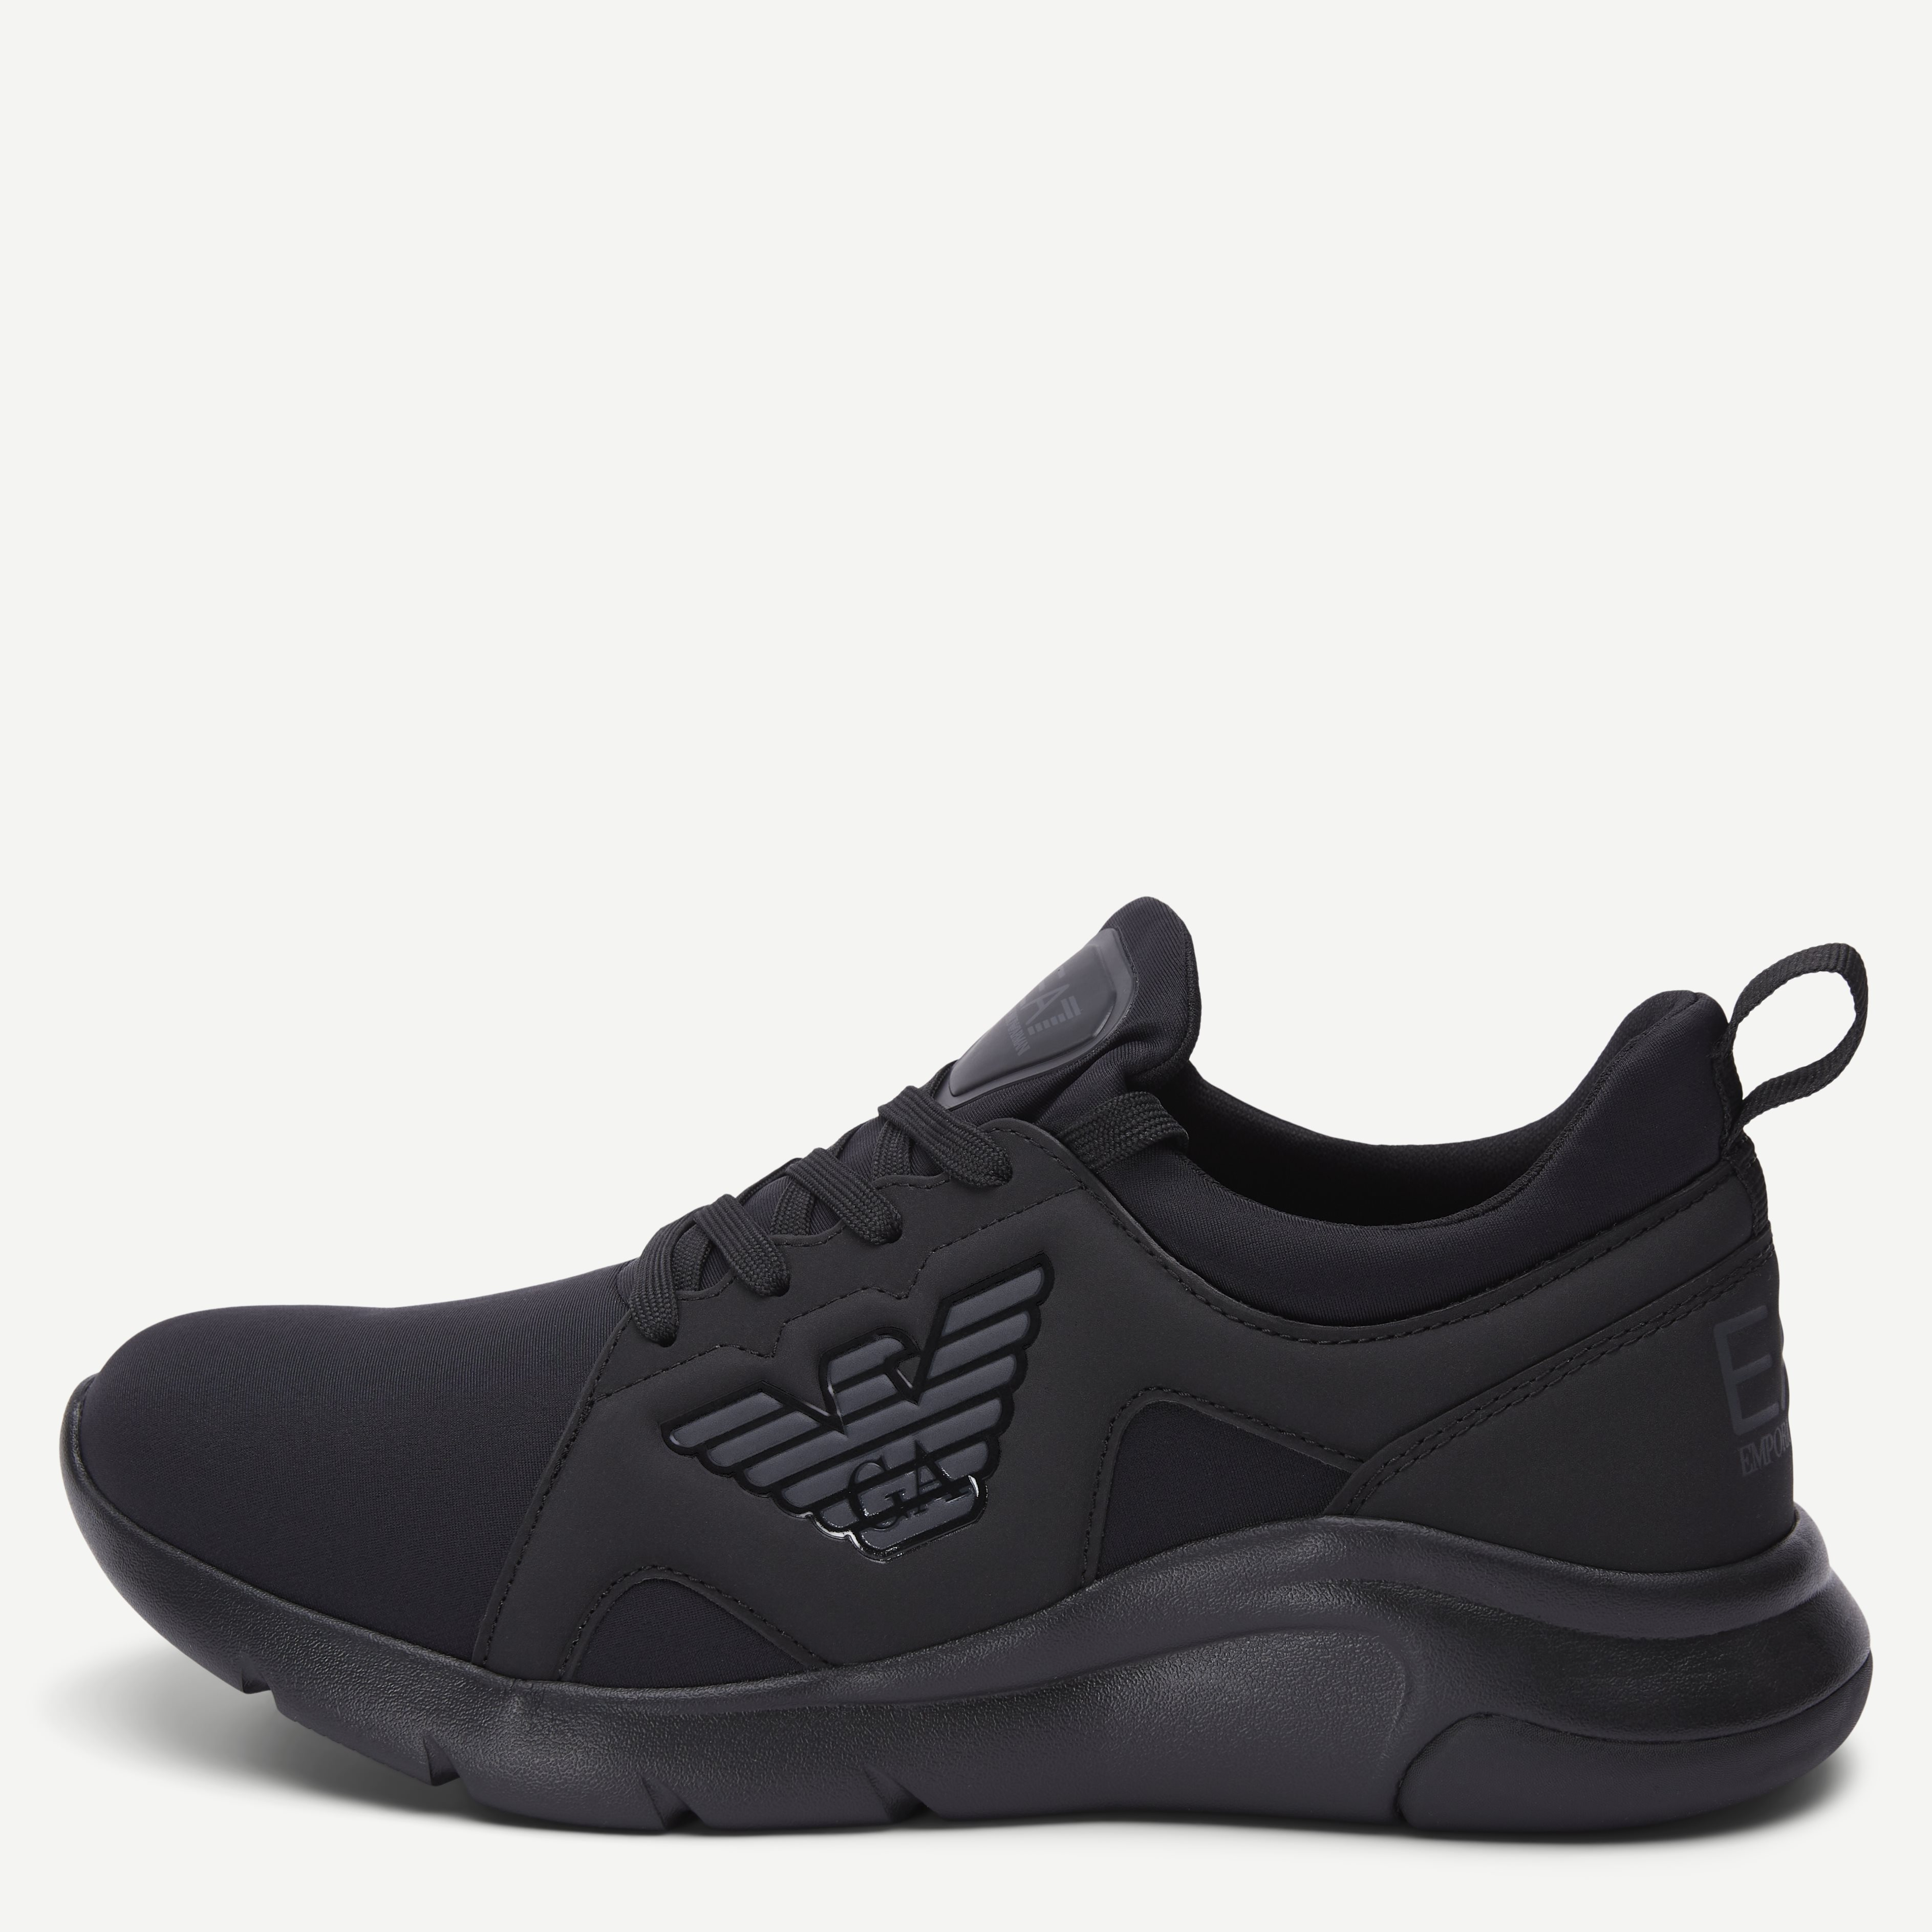 XK168 Sneaker - Sko - Sort